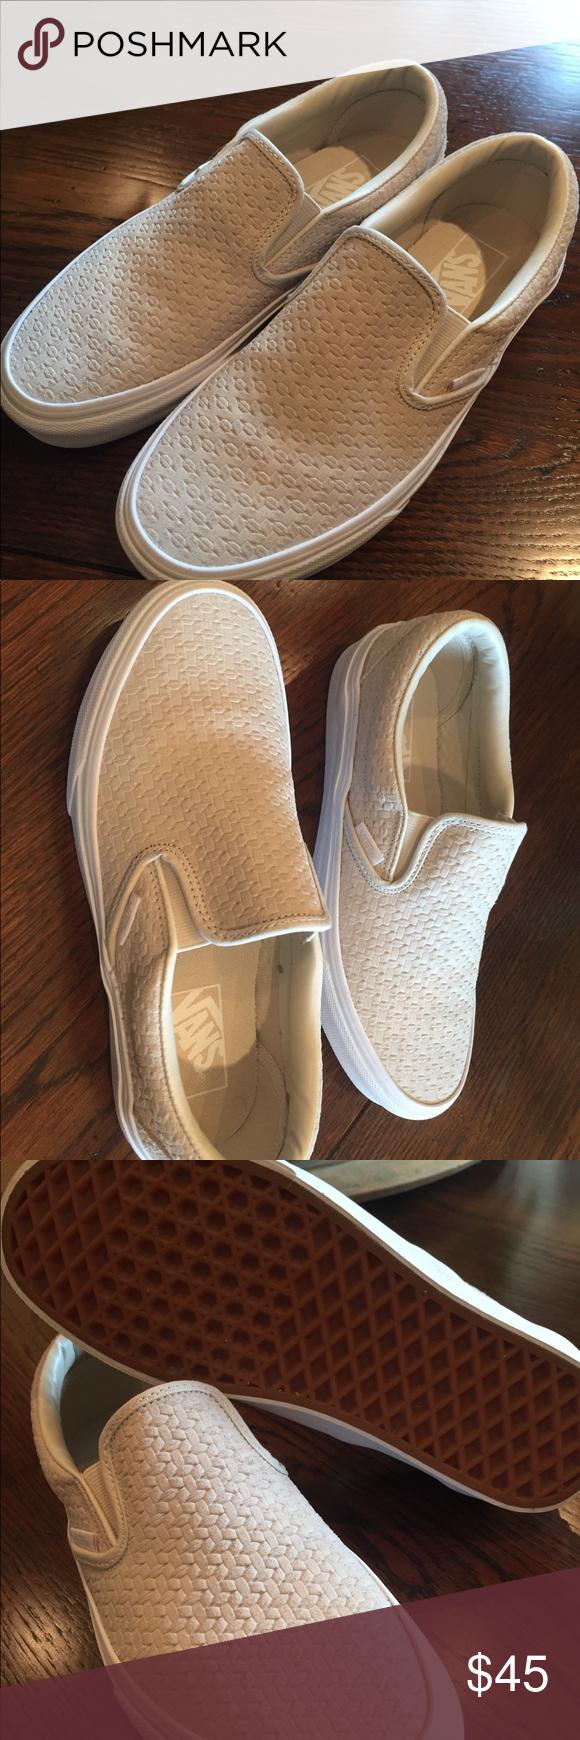 0548d07085a2de VANS slip on tennis shoes-BRAND NEW Vans classic slip ons